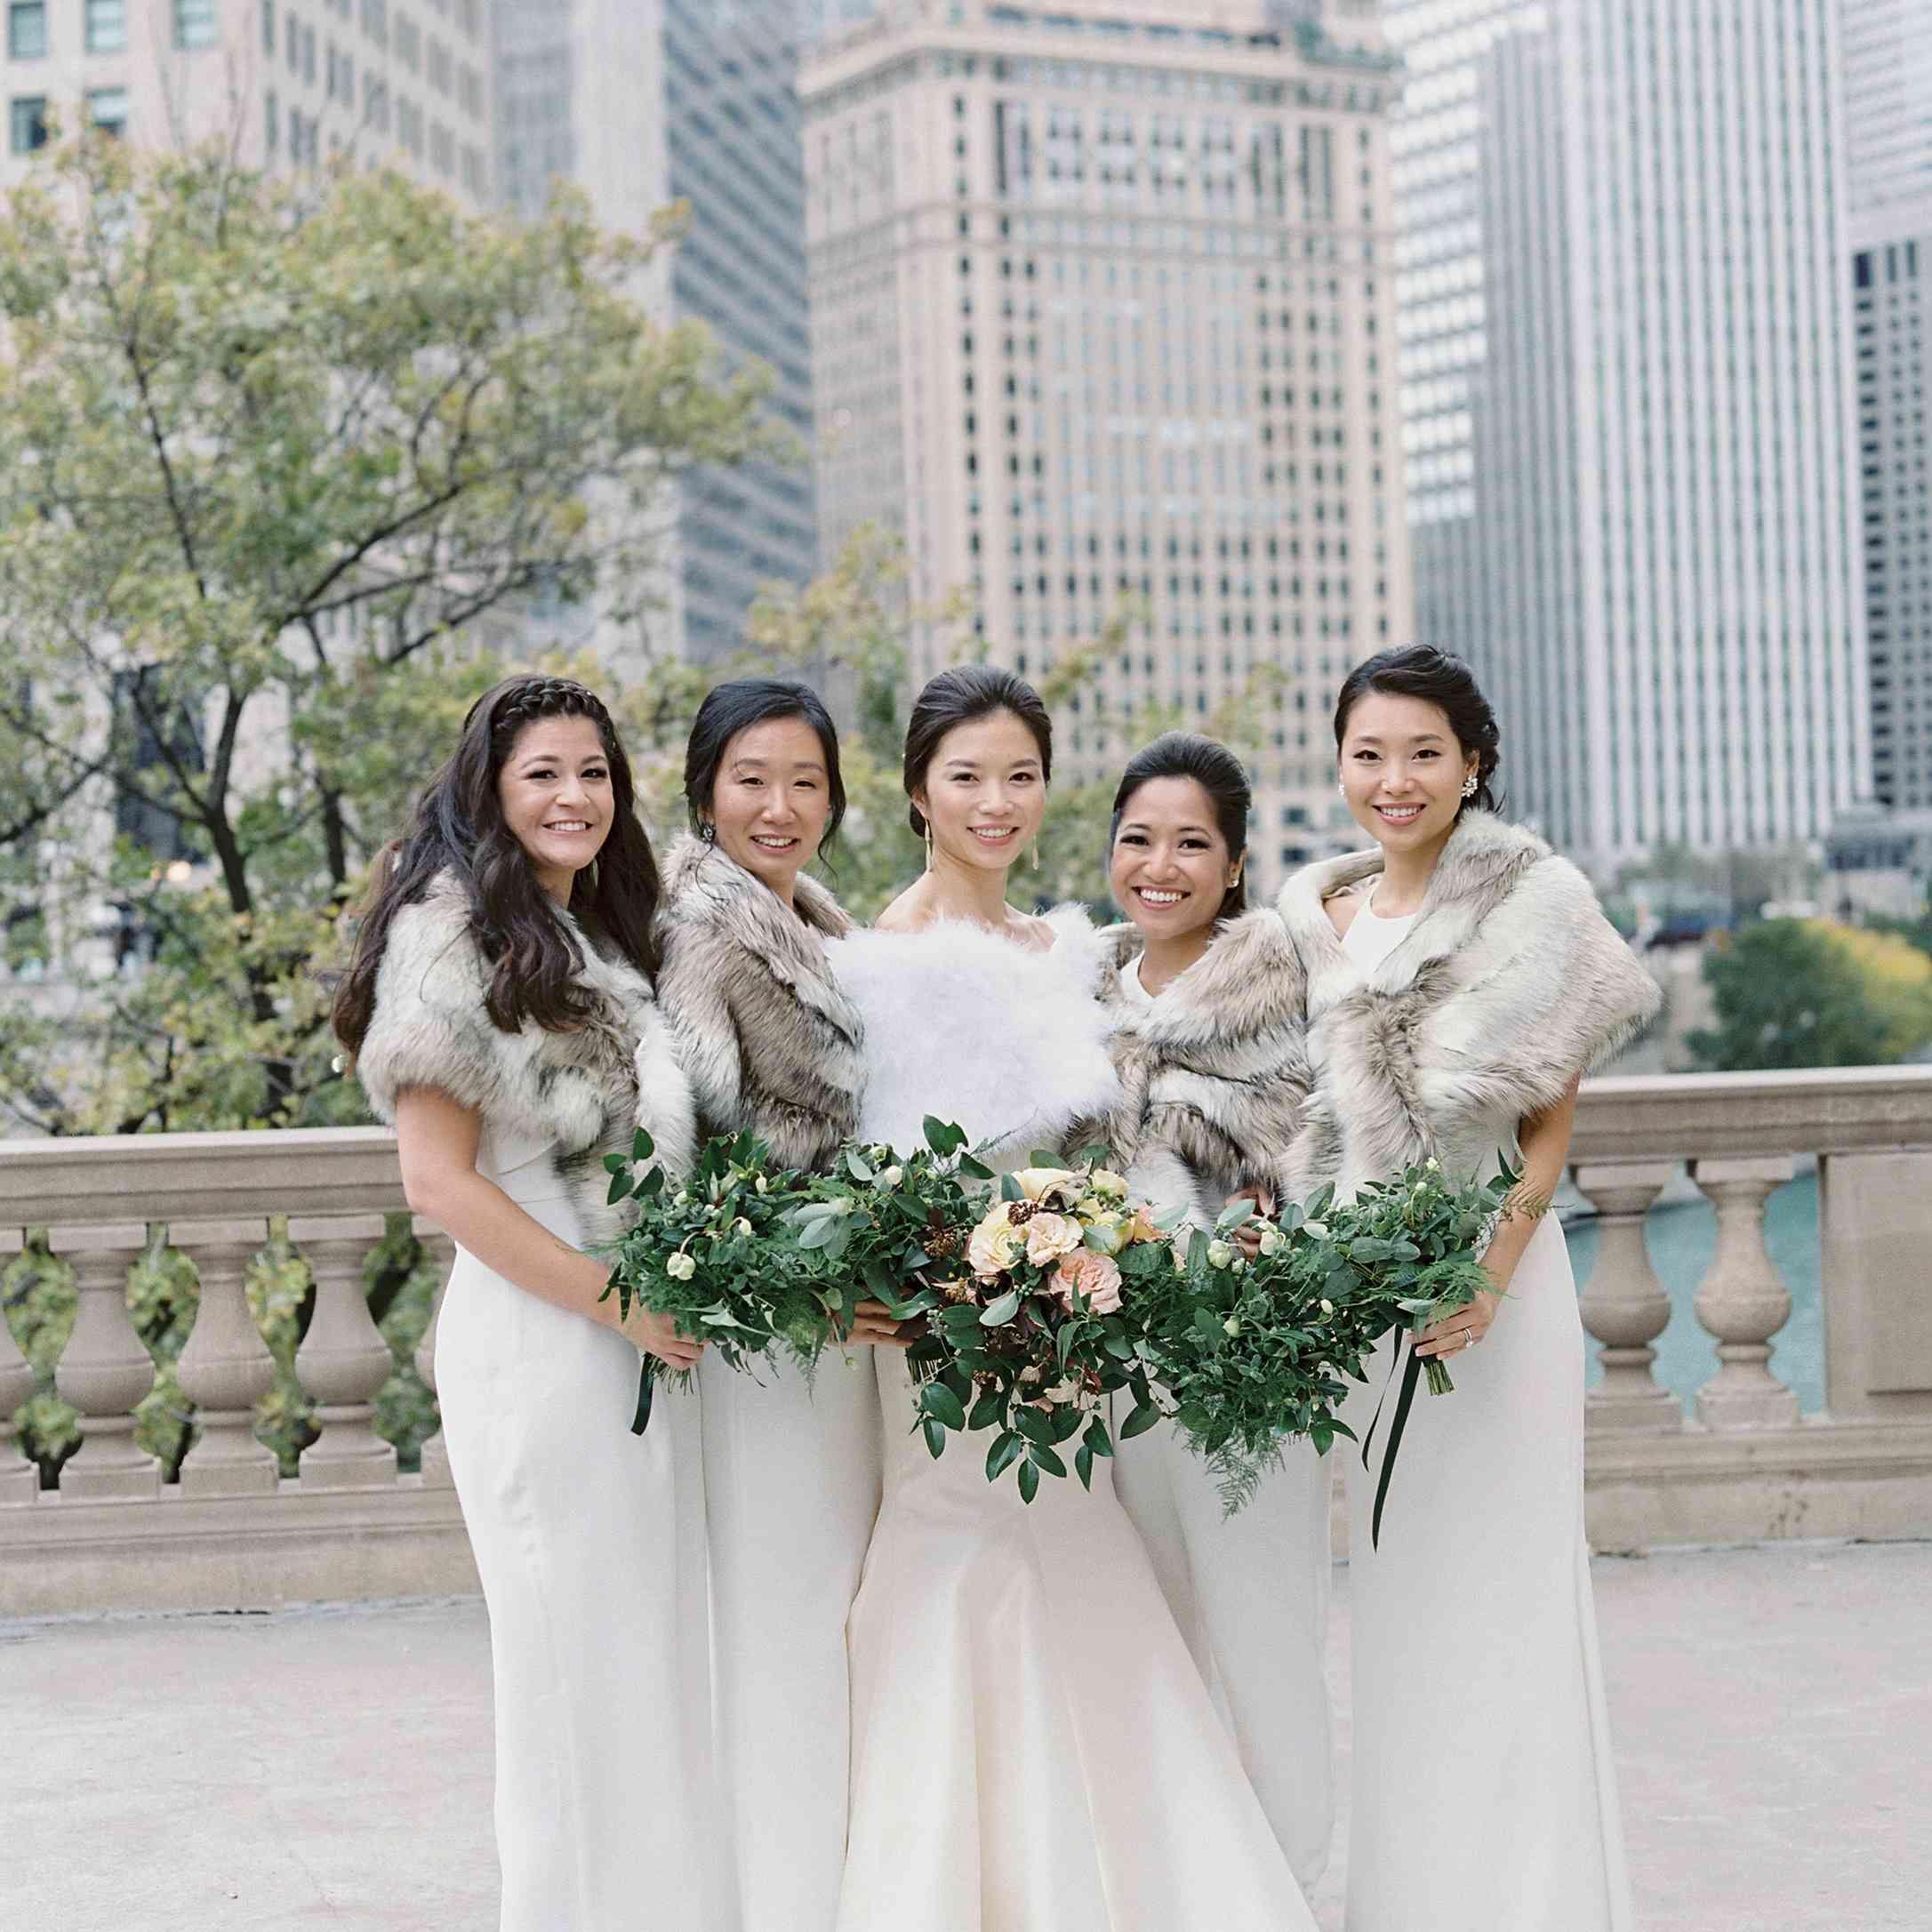 Bride and bridesmaids in faux fur stoles